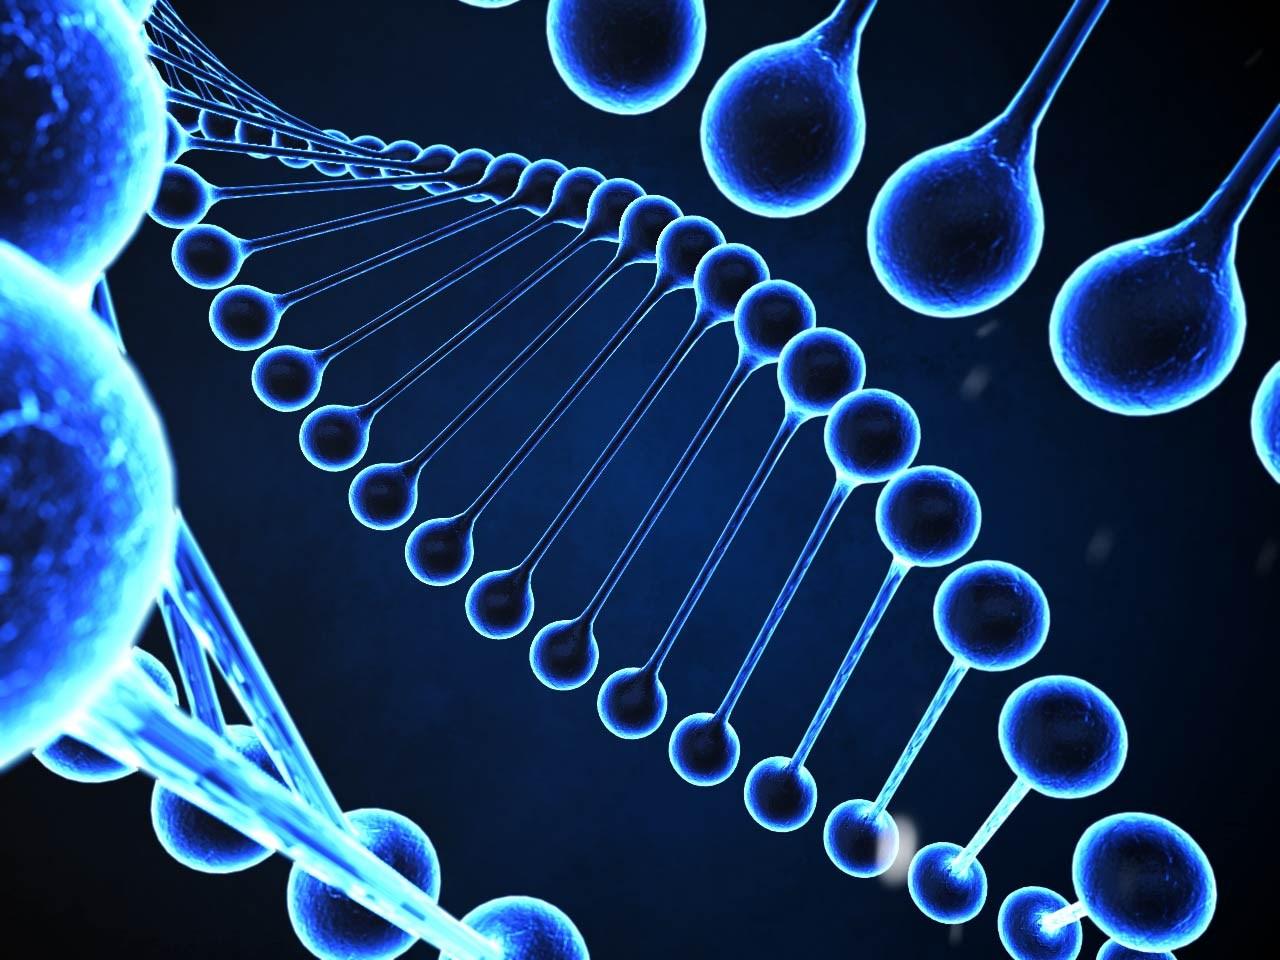 DNA_404311